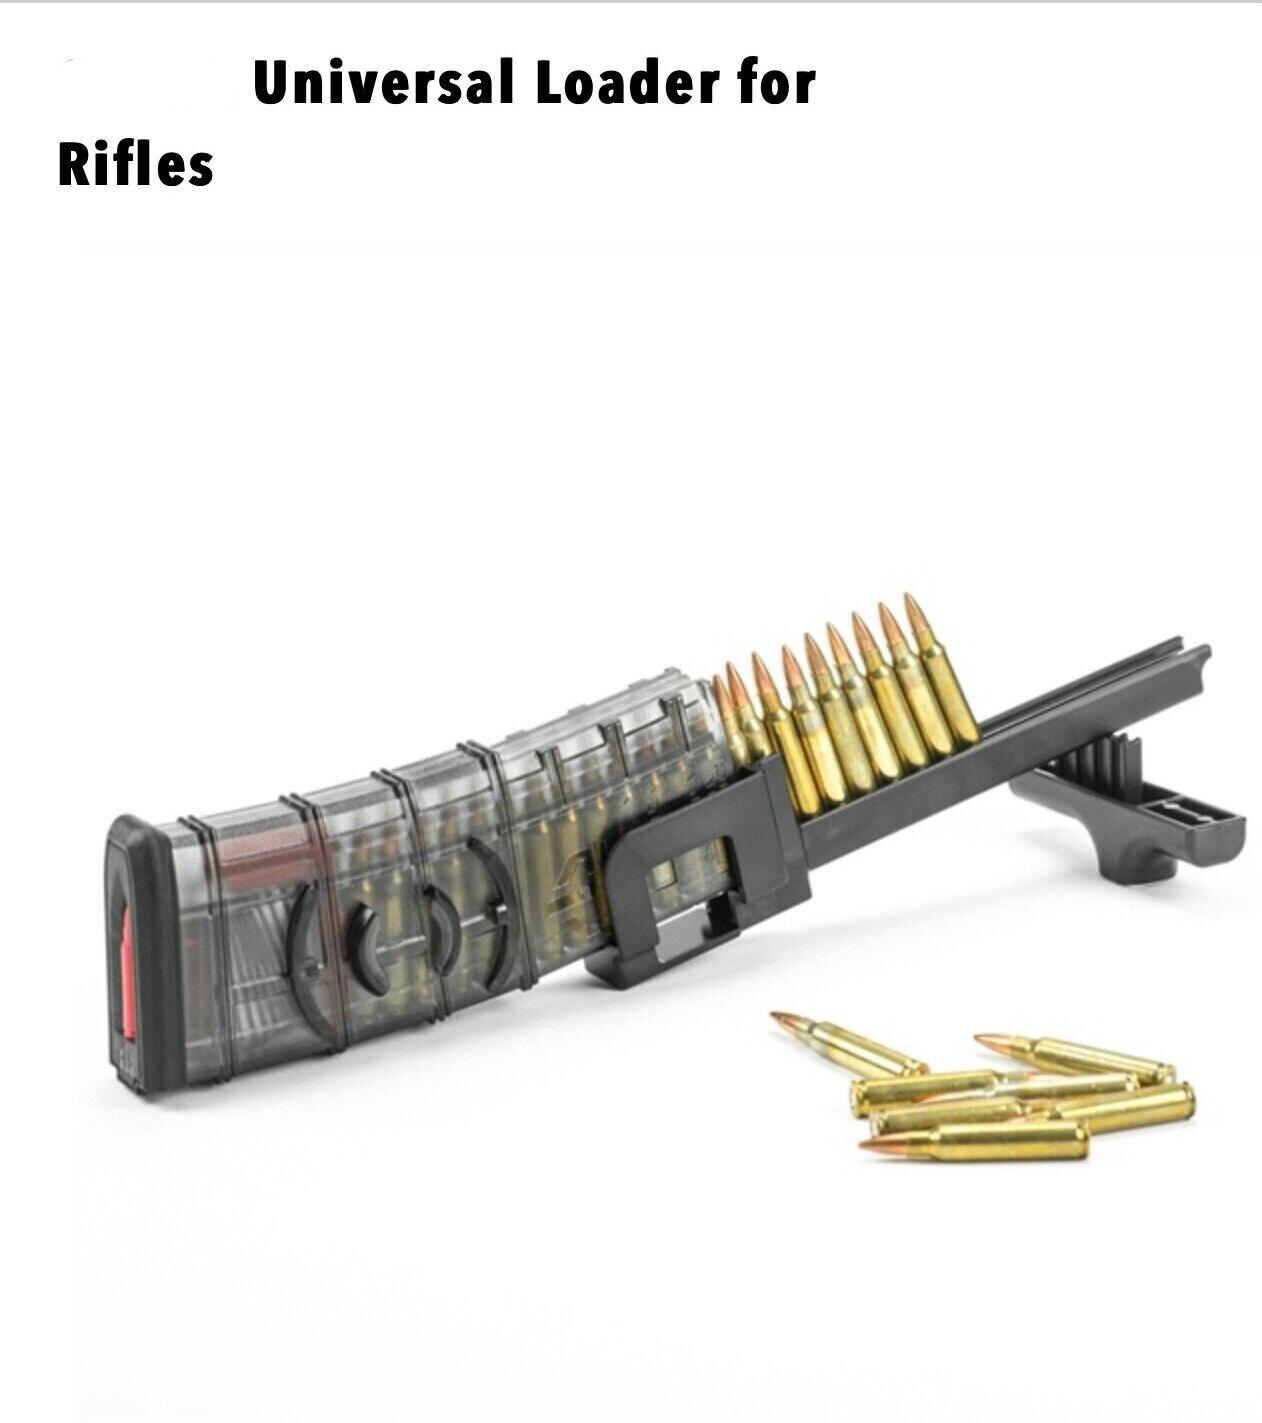 Magorui Universal Loader ความเร็วสำหรับปืนไรเฟิลนิตยสาร Universal 223 556 308 762x39 Hunt ปืน Ruger Colt